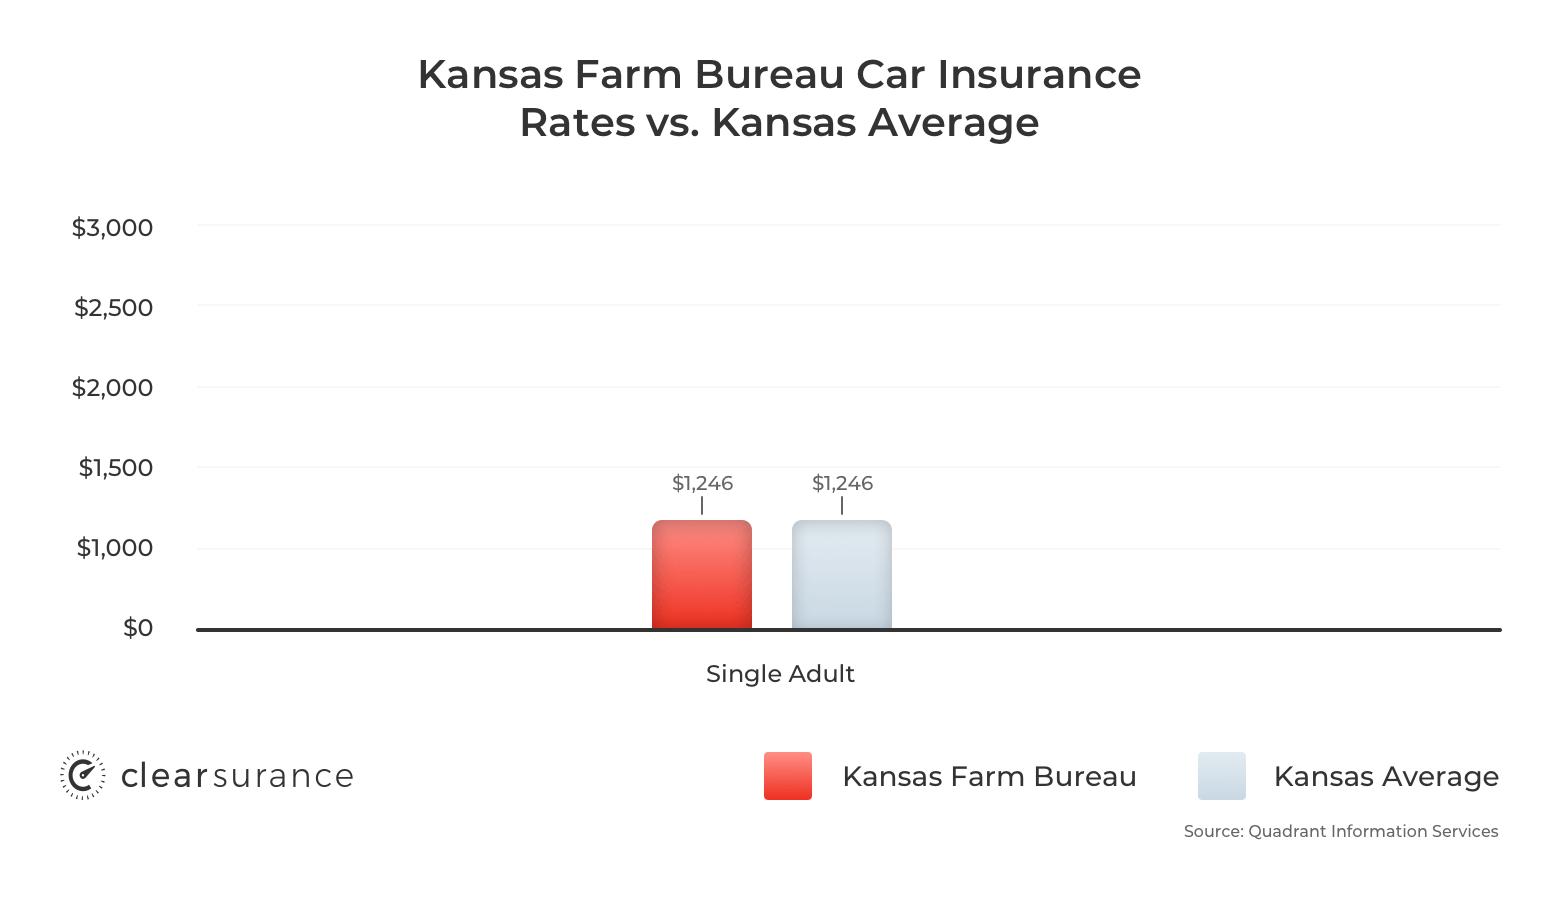 Graph comparing Kansas Farm Bureau car insurance rates vs the Kansas average